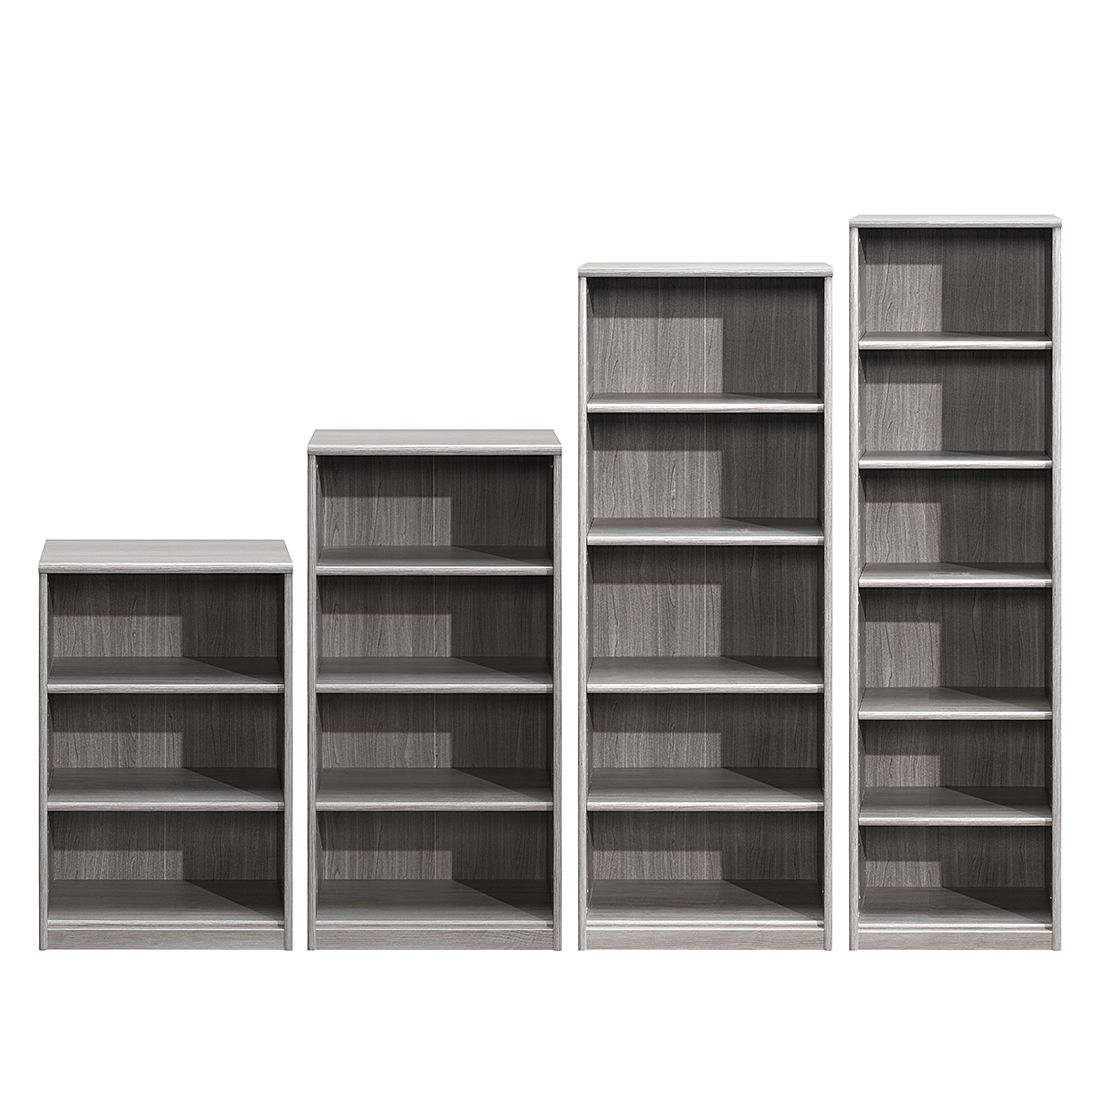 regal soft plus i silbereiche dekor f cher 5 h he 148 cm. Black Bedroom Furniture Sets. Home Design Ideas